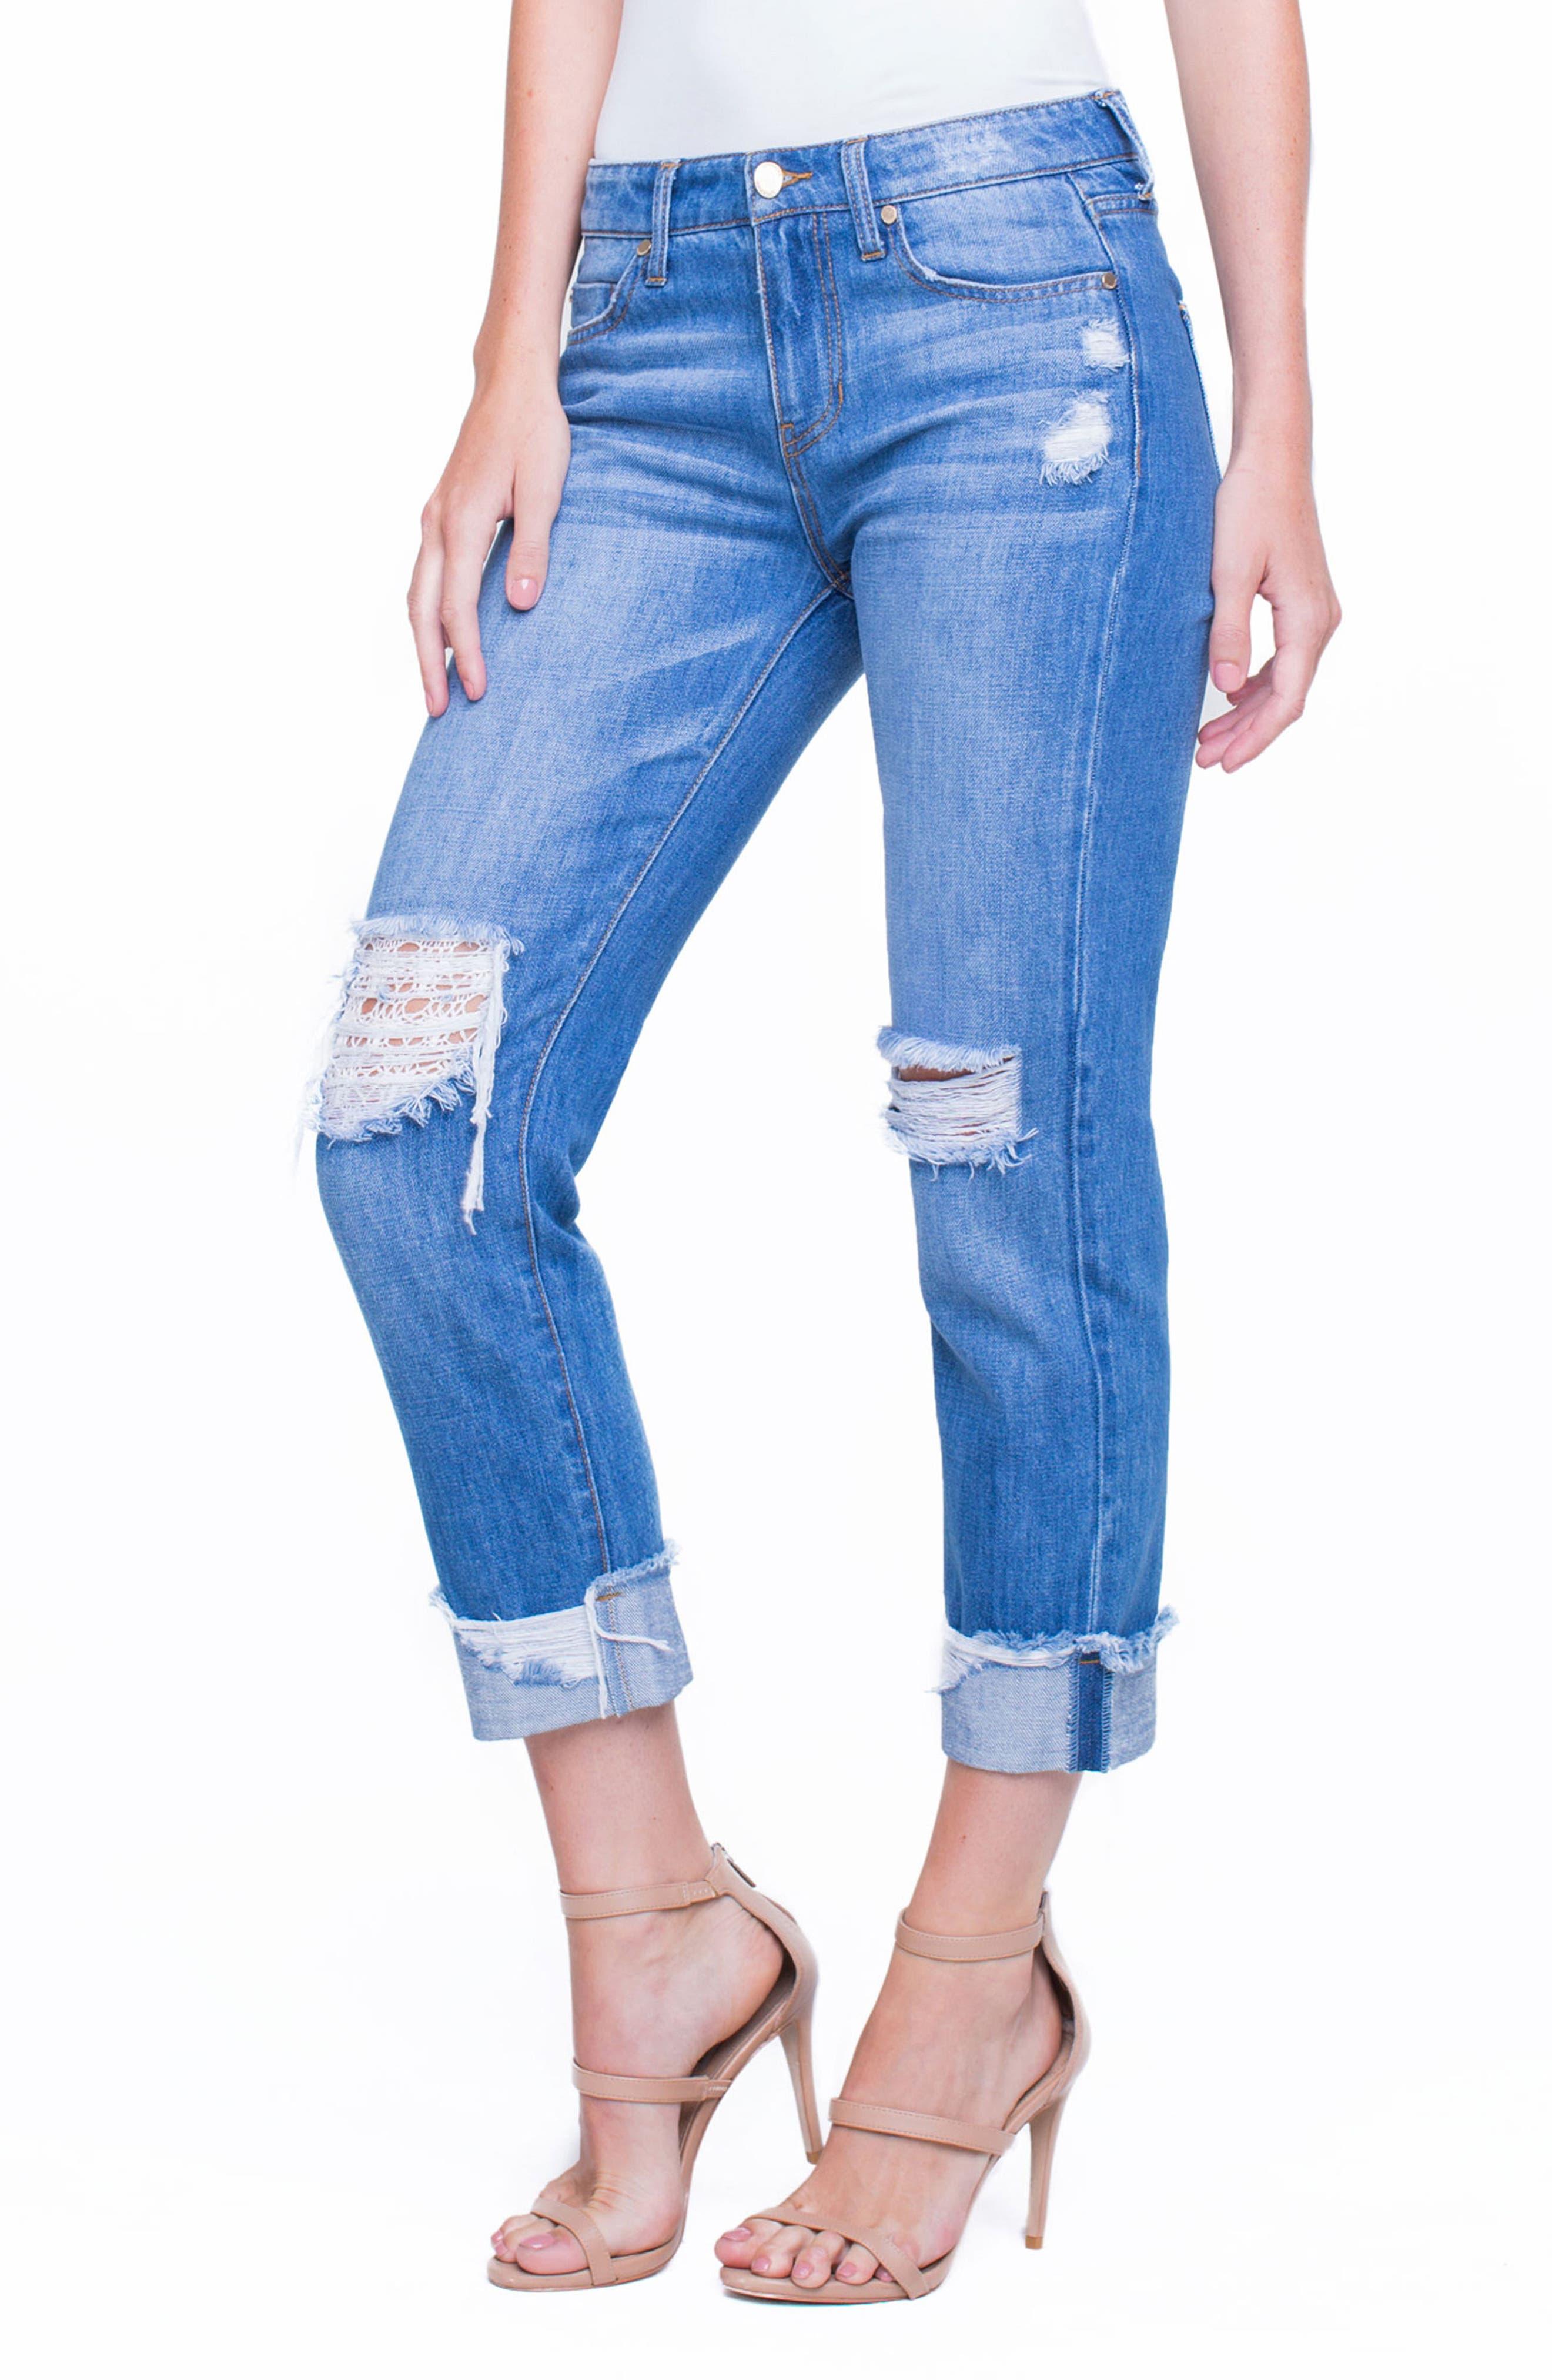 Jeans Company Kennedy Distressed Raw Hem Crop Boyfriend Jeans,                             Alternate thumbnail 3, color,                             402